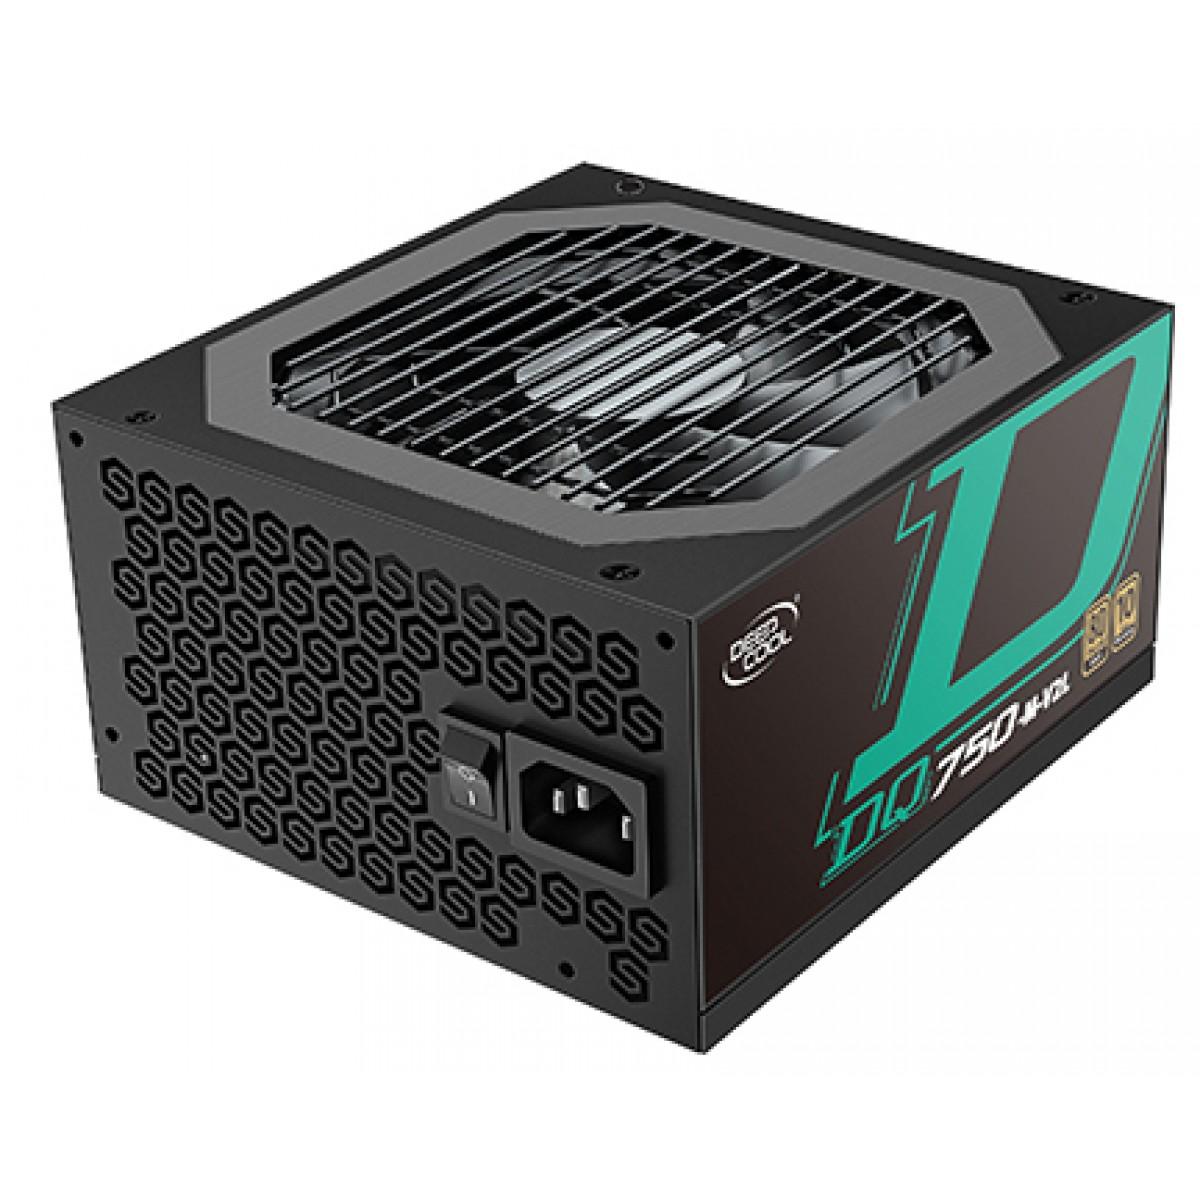 Fonte DeepCool DQ750, 750W, 80 Plus Gold, PFC Ativo, Full Modular, DP-DQ750-M-V2L